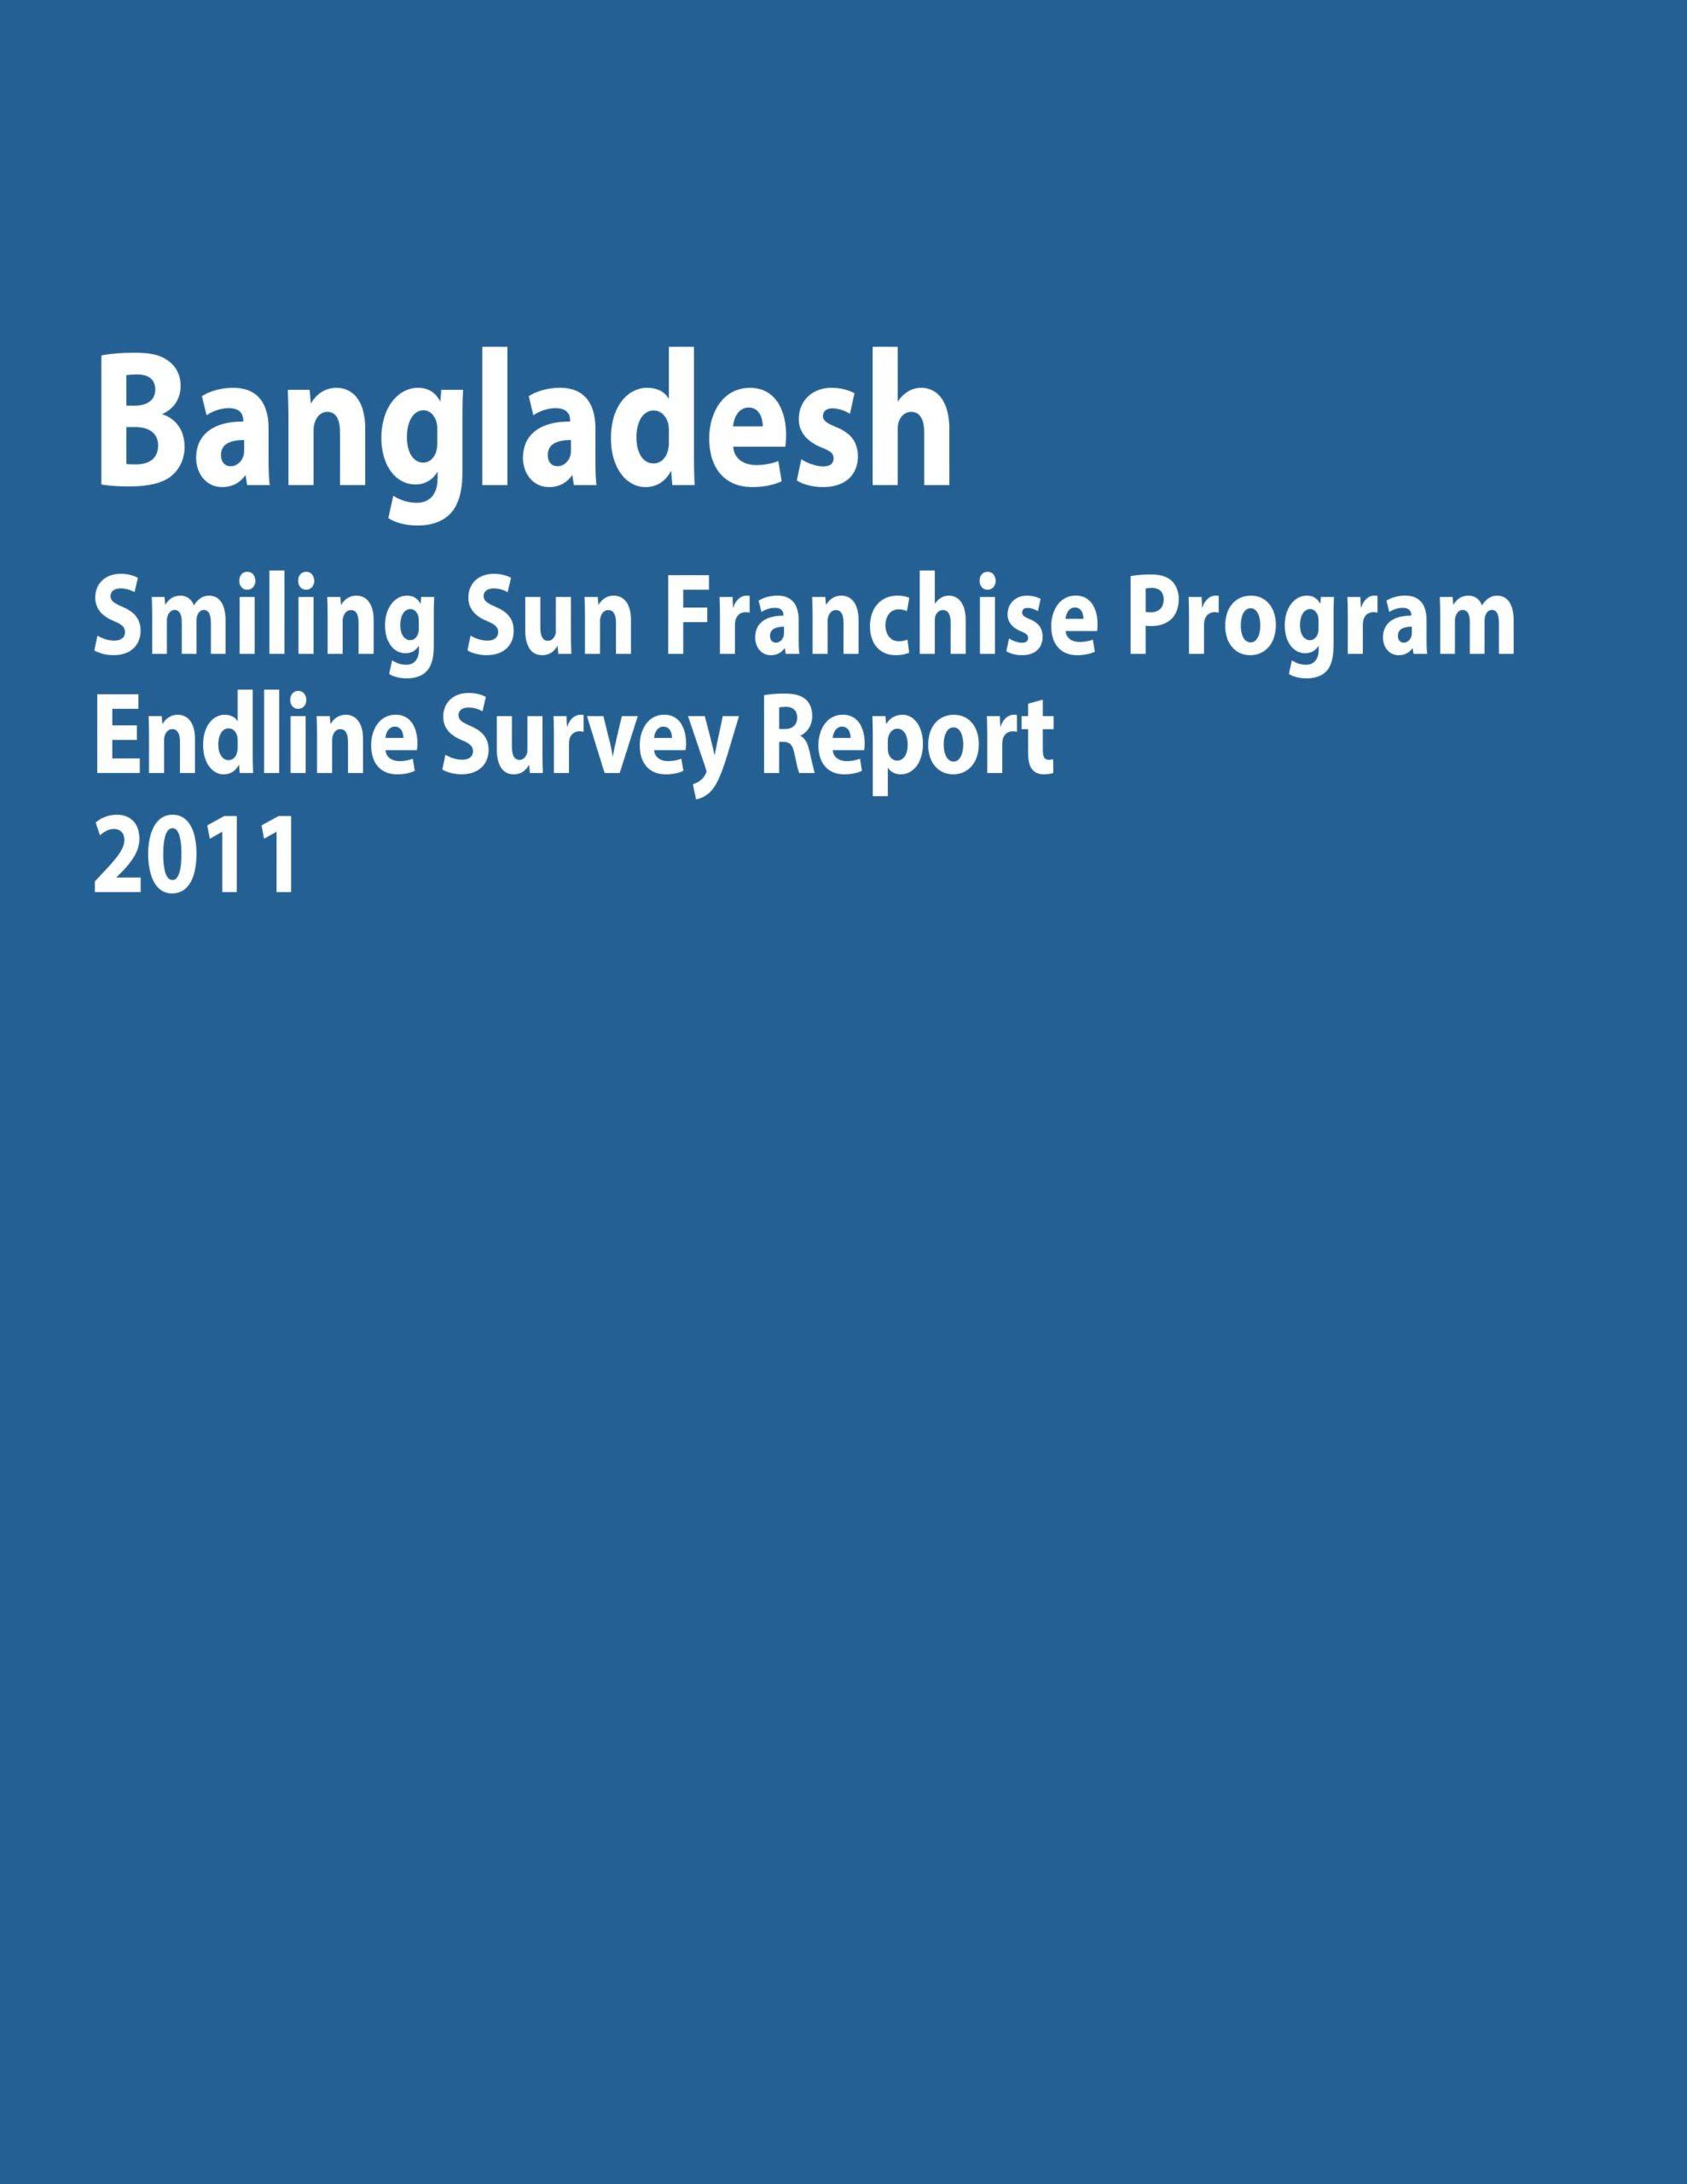 Bangladesh Smiling Sun Franchise Program Endline Survey Report 2011